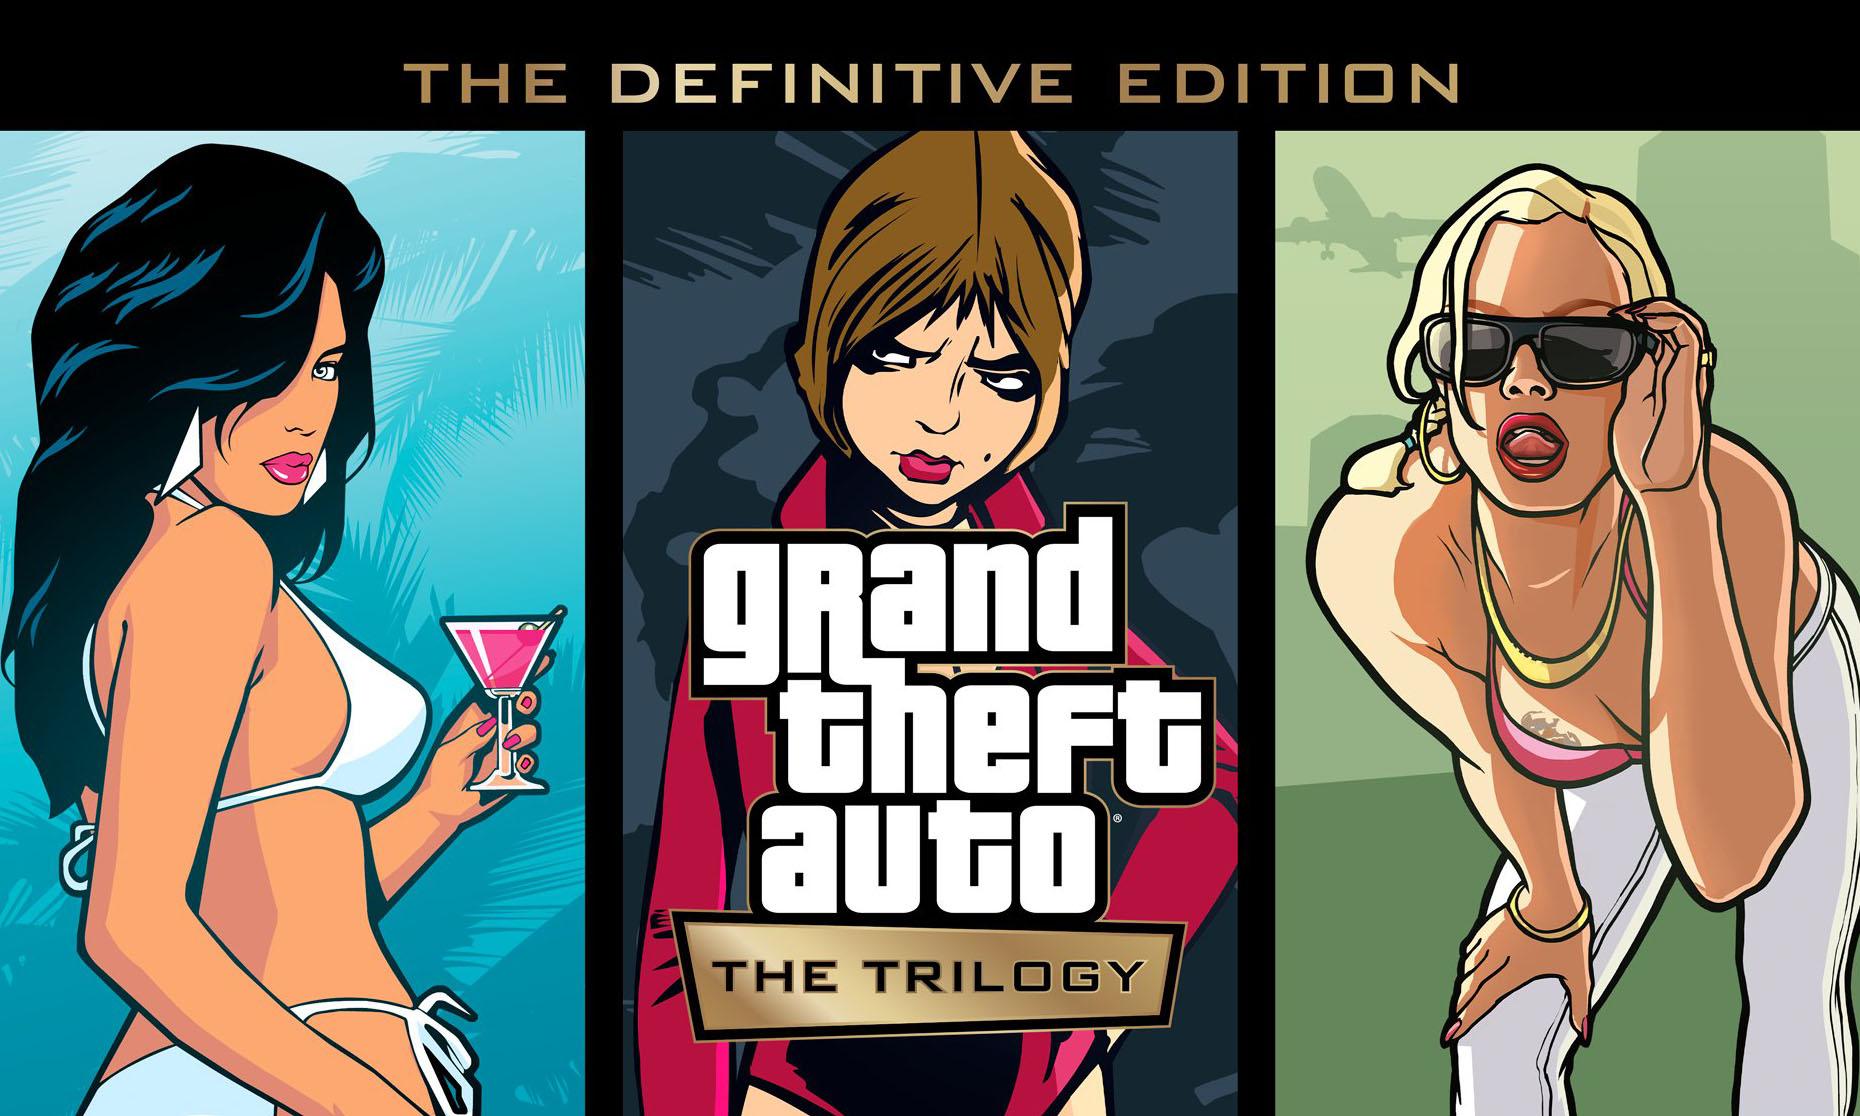 Rockstar 正式宣布推出 GTA 三部曲经典重制